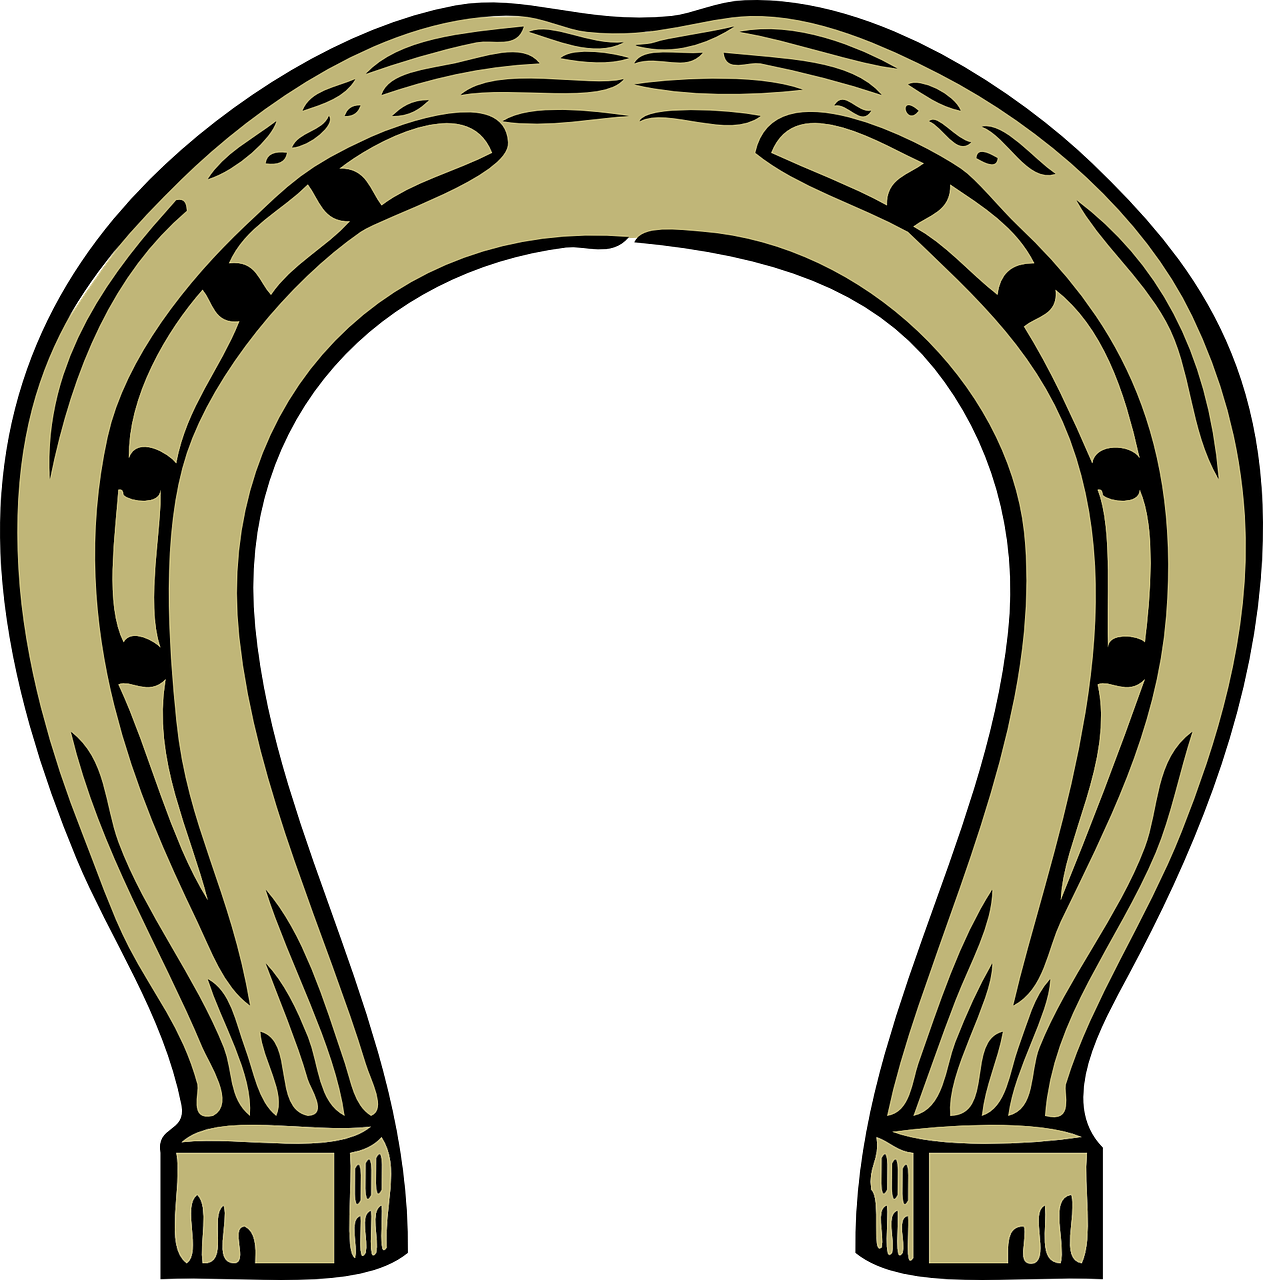 Horseshoe vector png. Metal horse shoe symbol